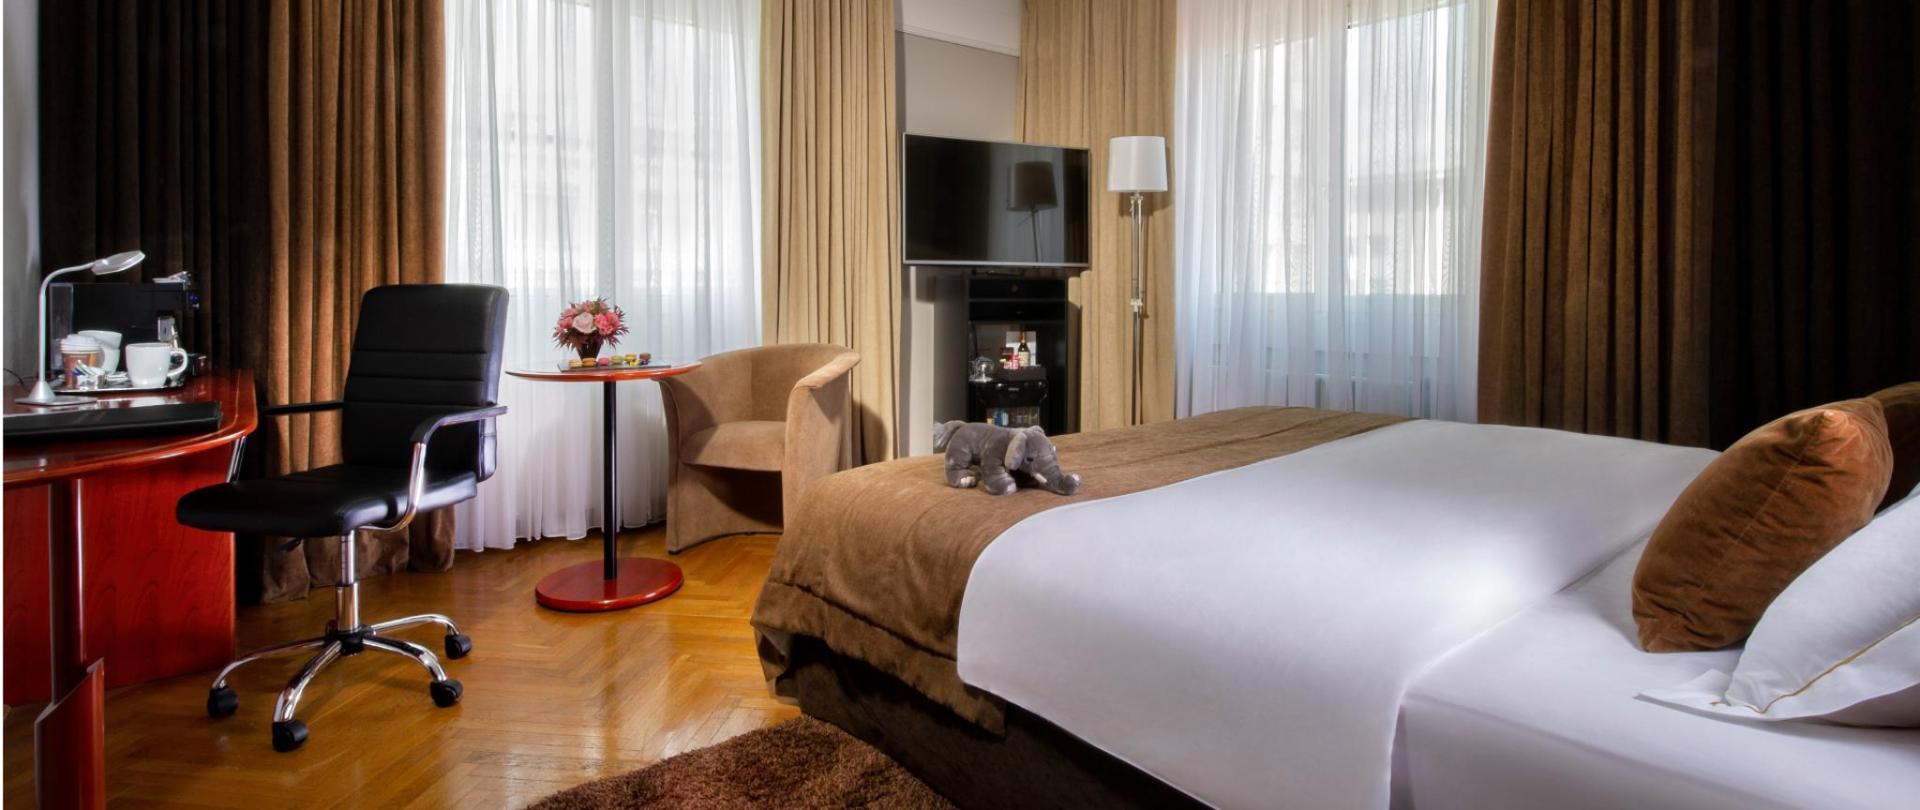 HotelSlon_ByZigaKoritnik2018_Deluxe room.png